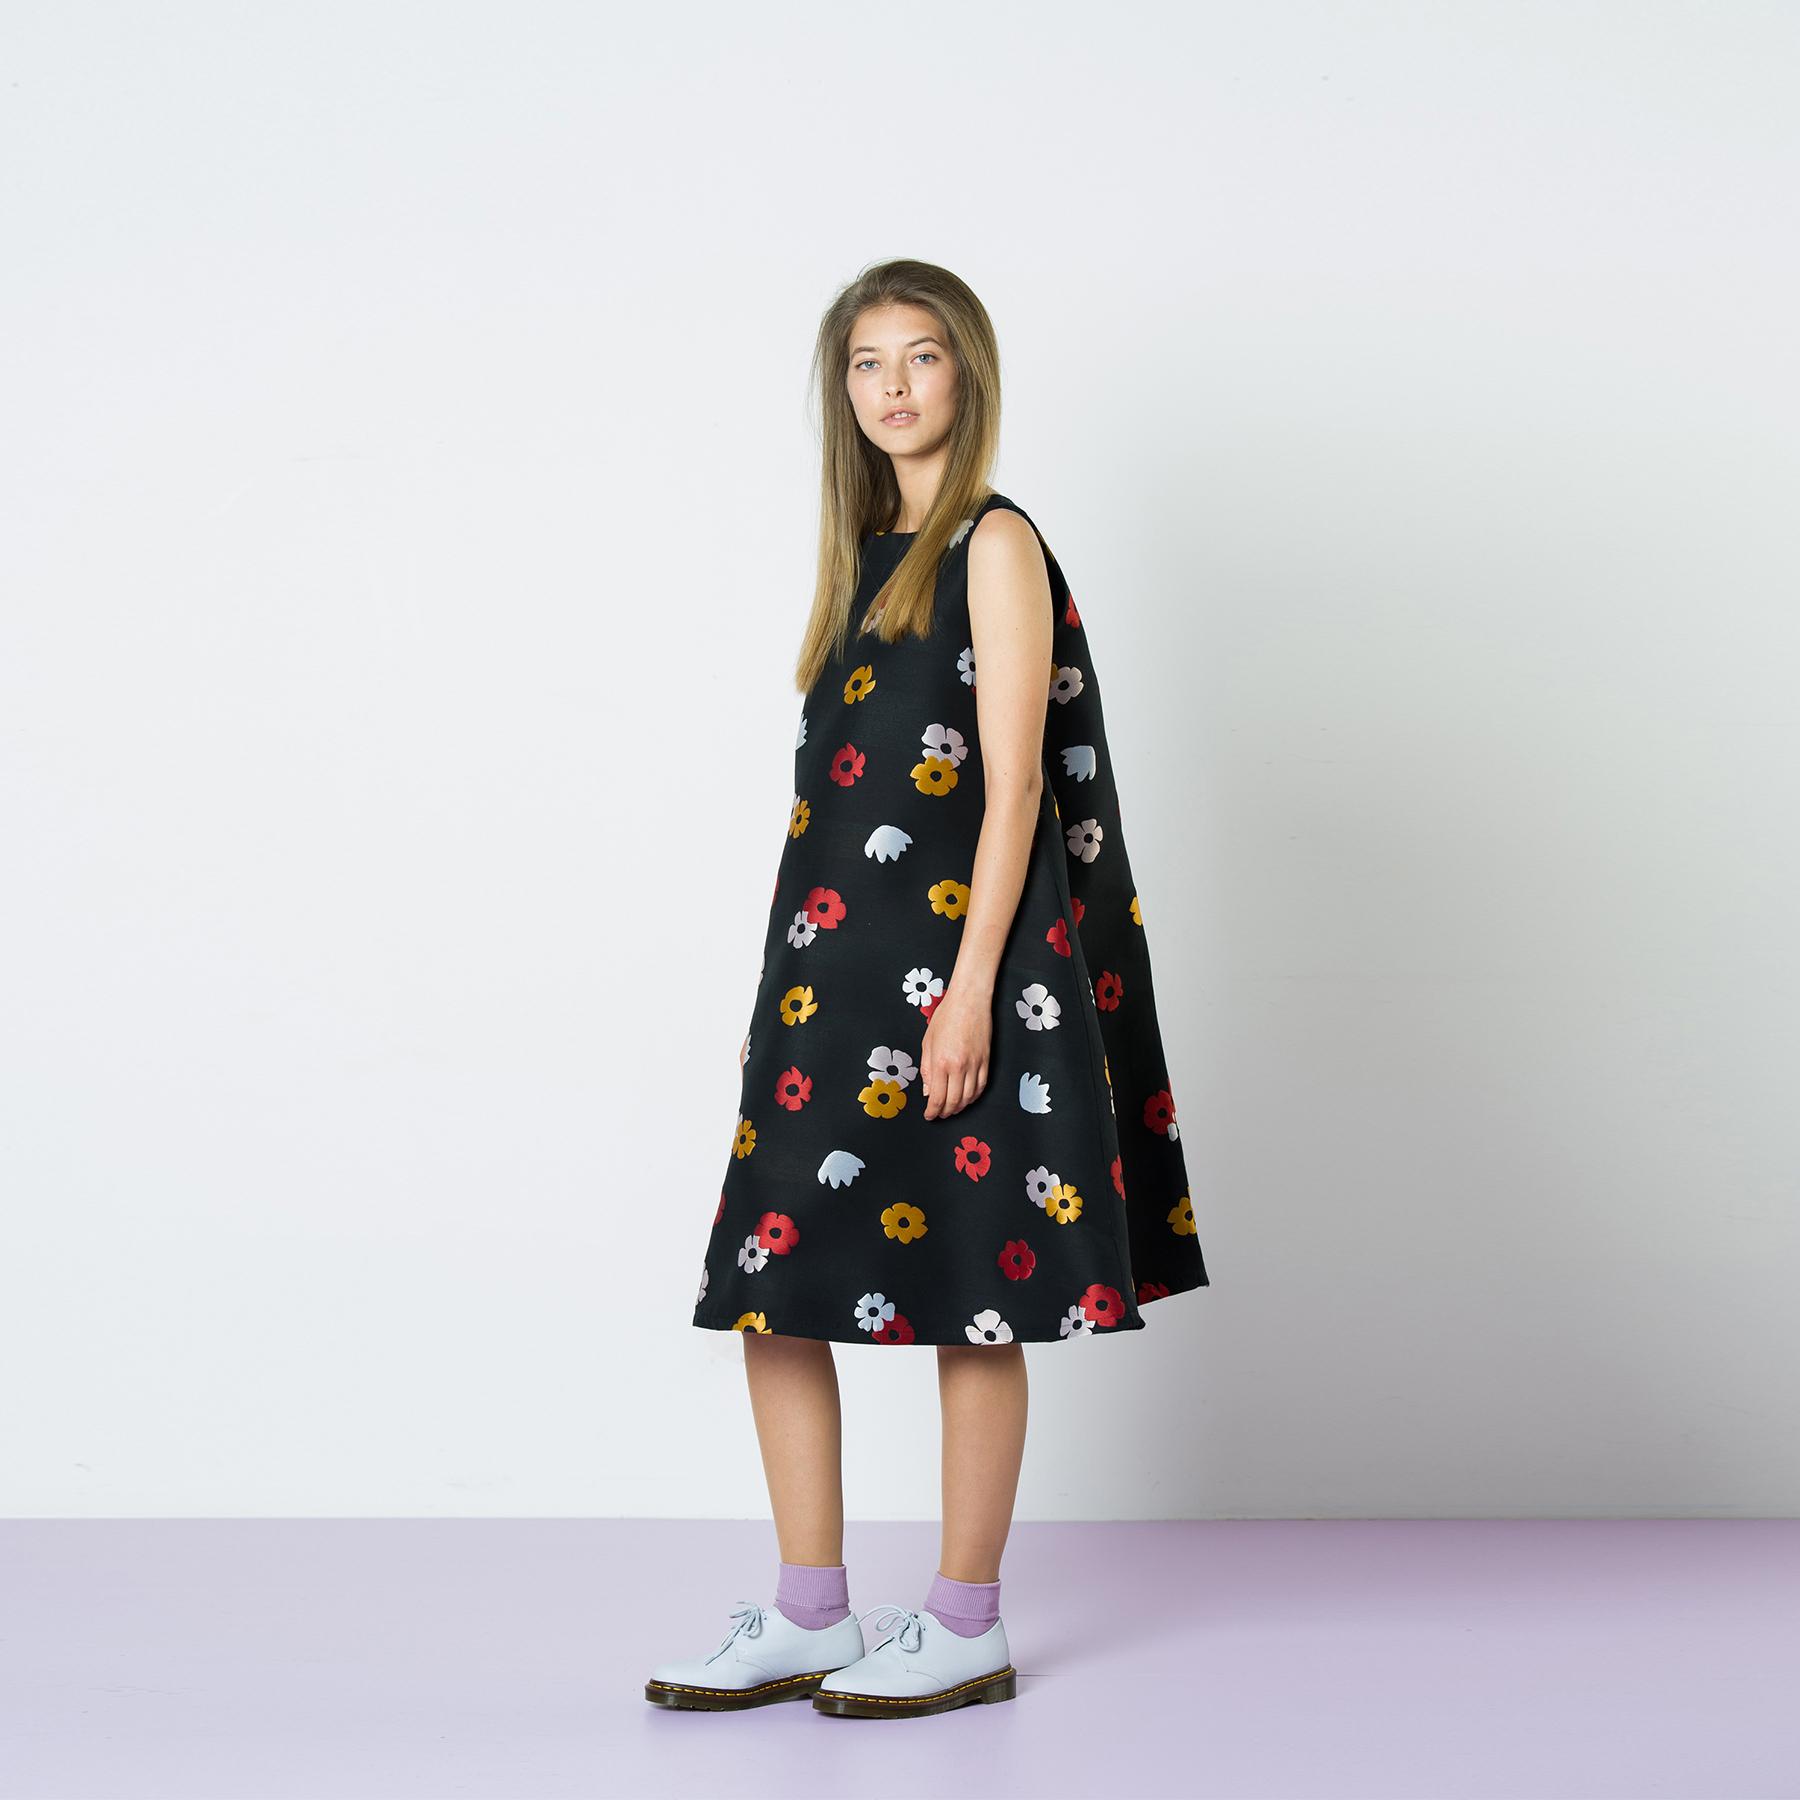 LB squares_0000_41. Norwood dress.jpg